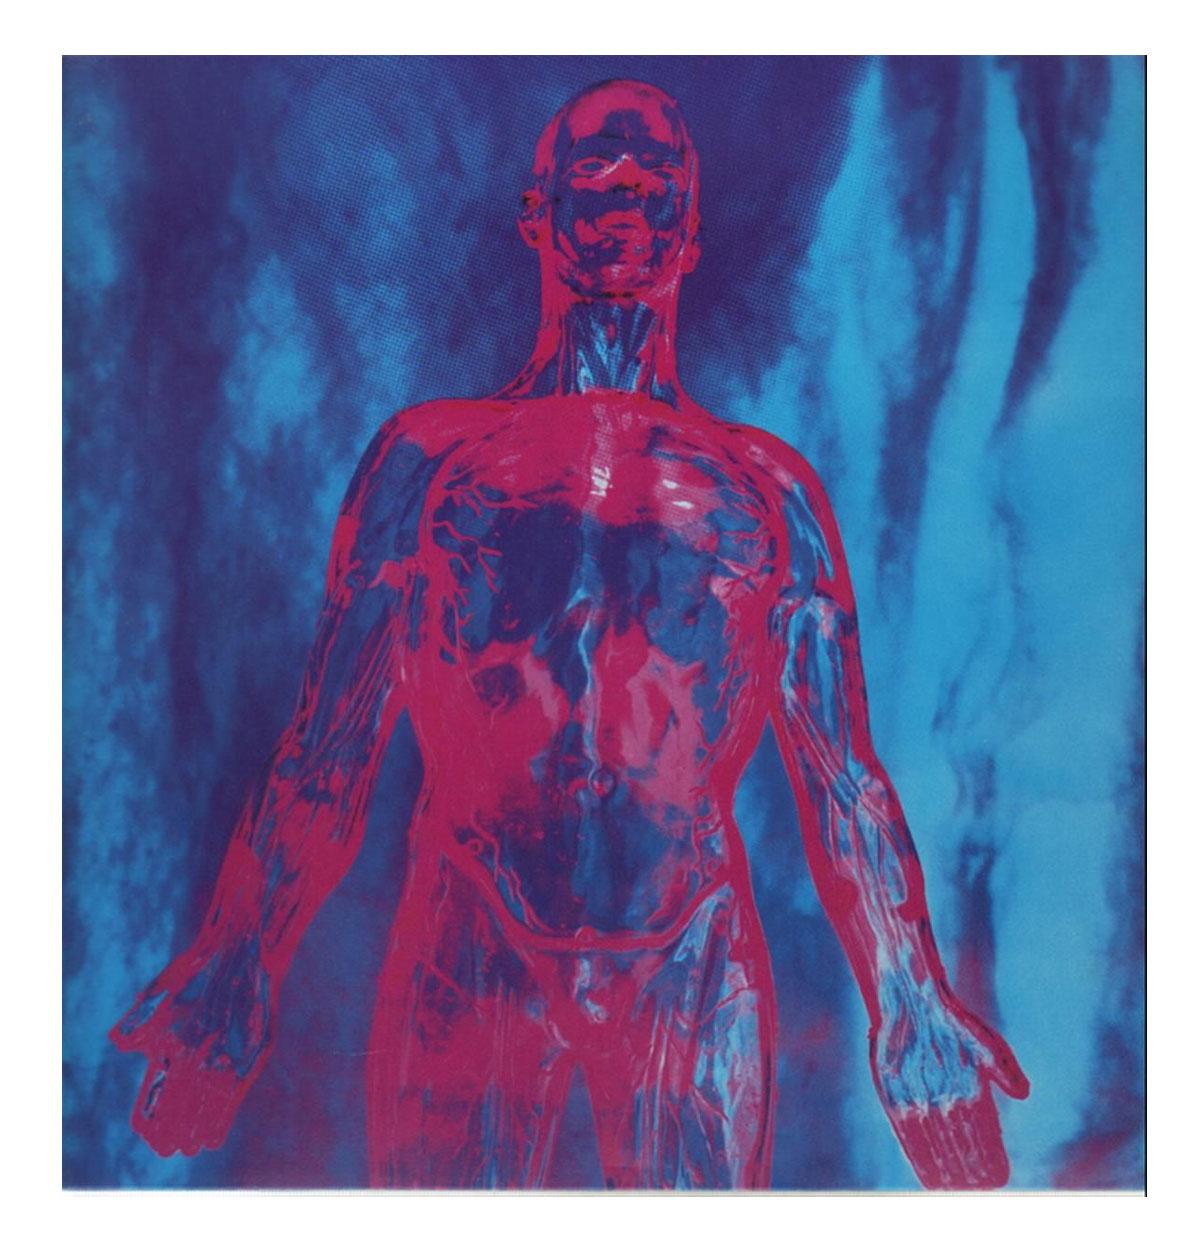 Single: Nirvana - Sliver